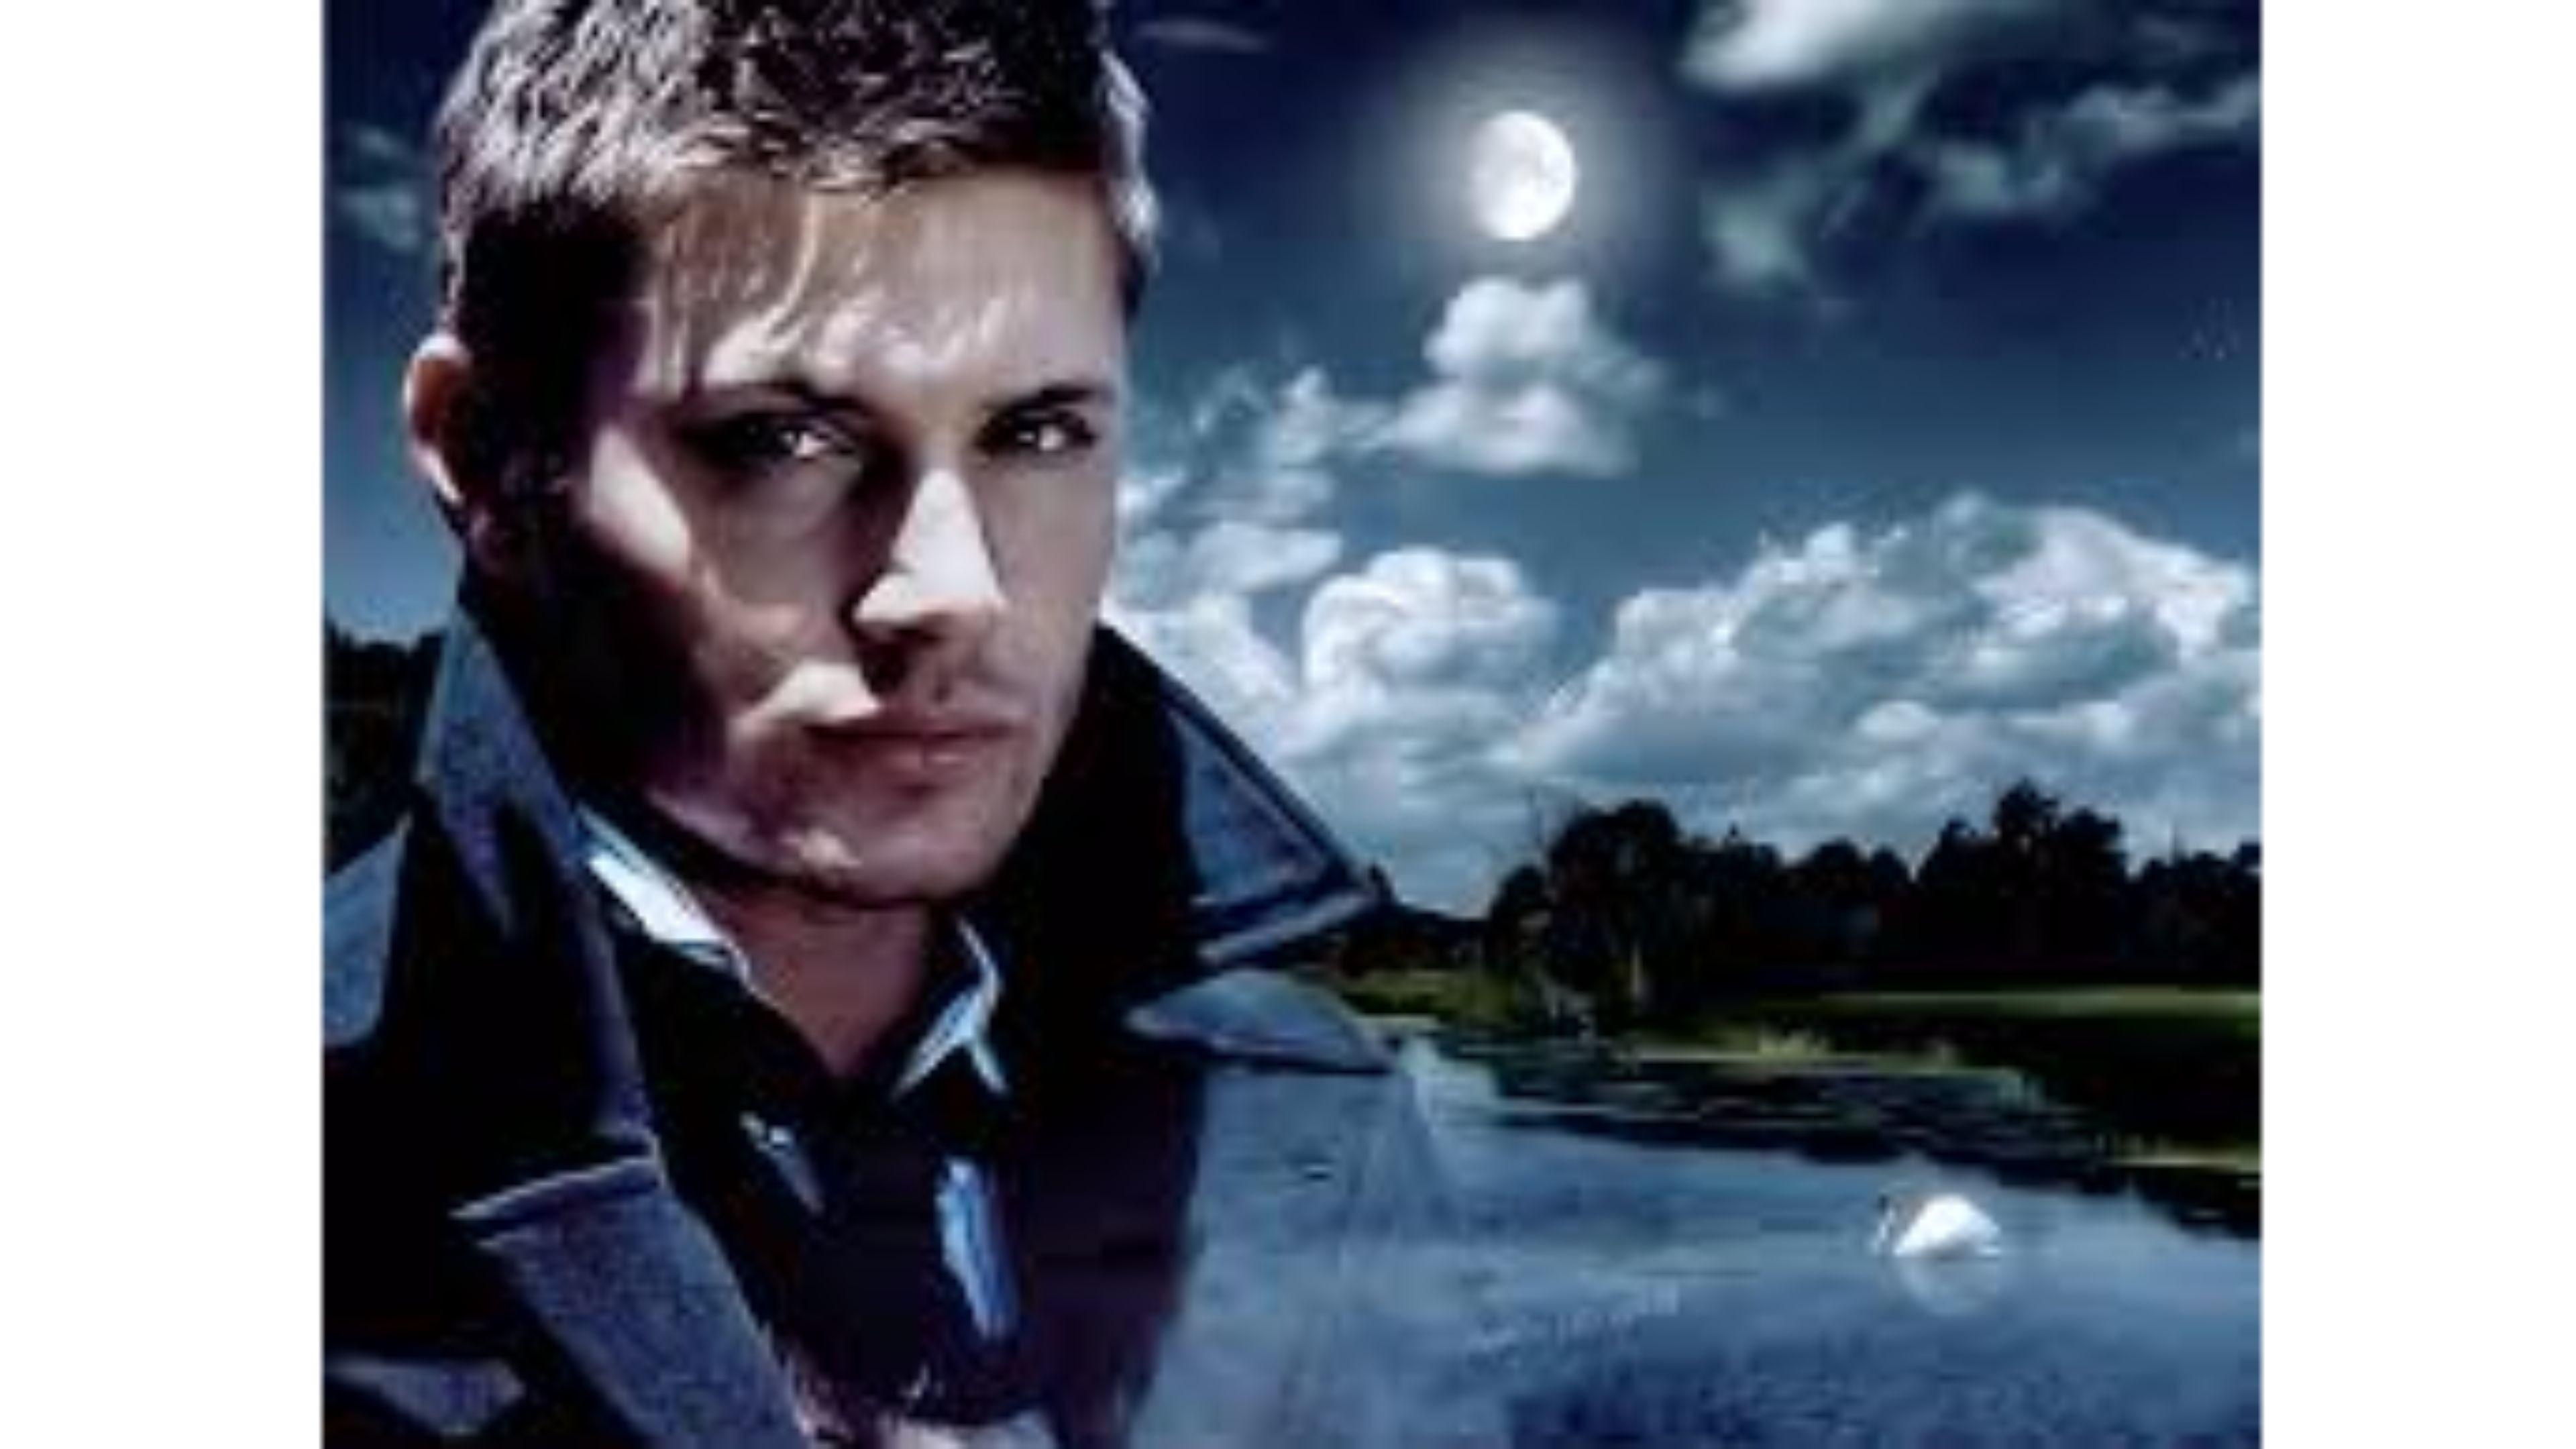 Jensen Ackles Wallpaper HD (83+ images)